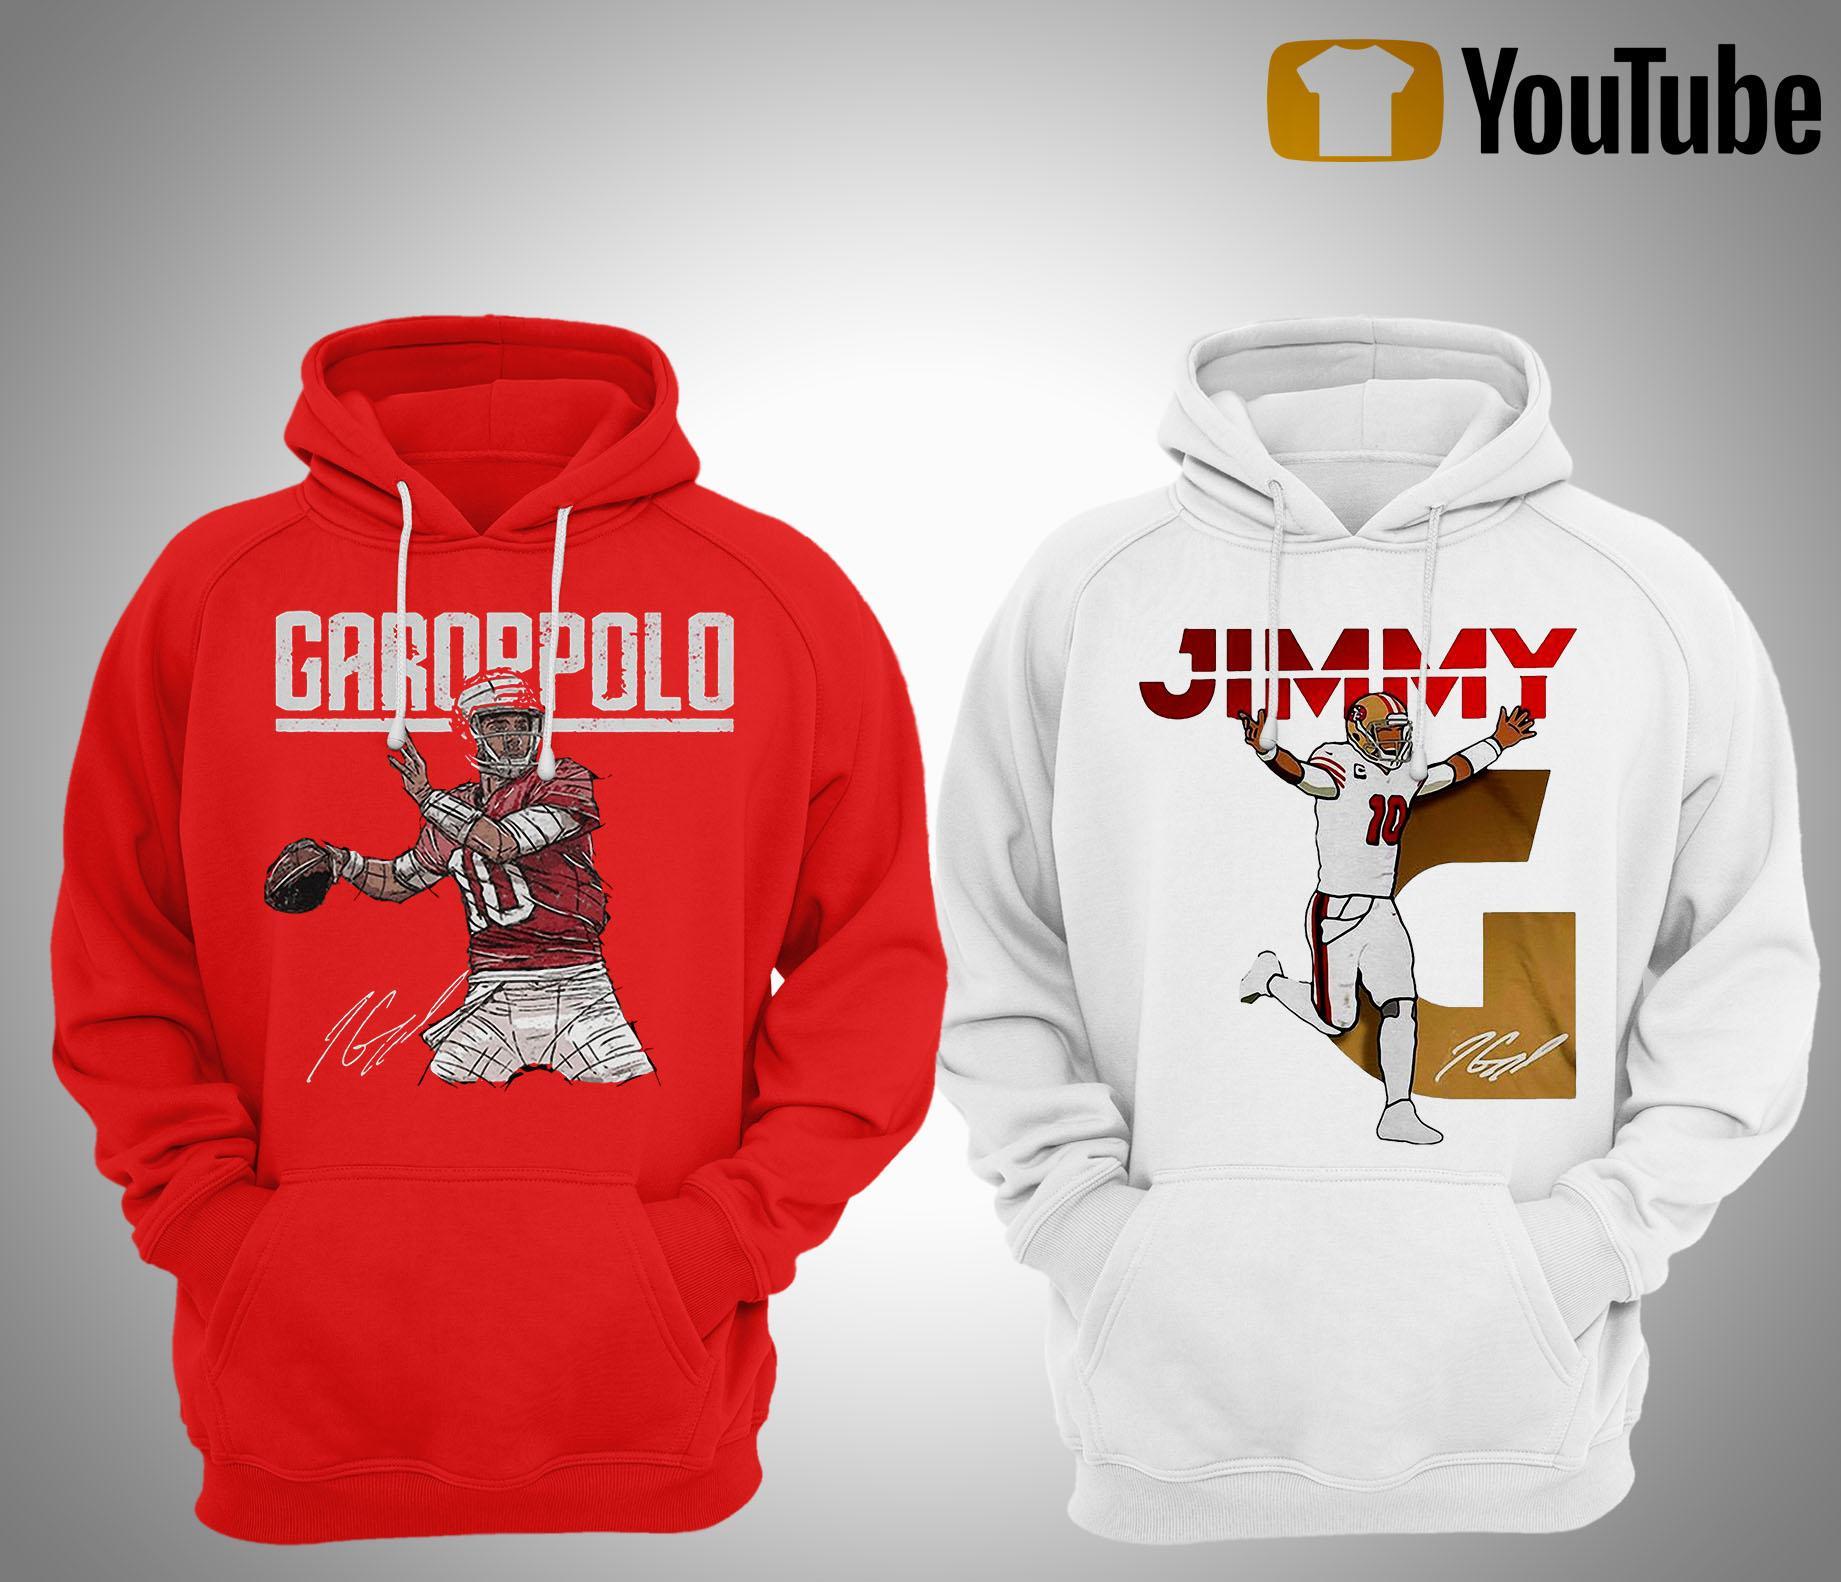 Jimmy Garoppolo Signature T Hoodie